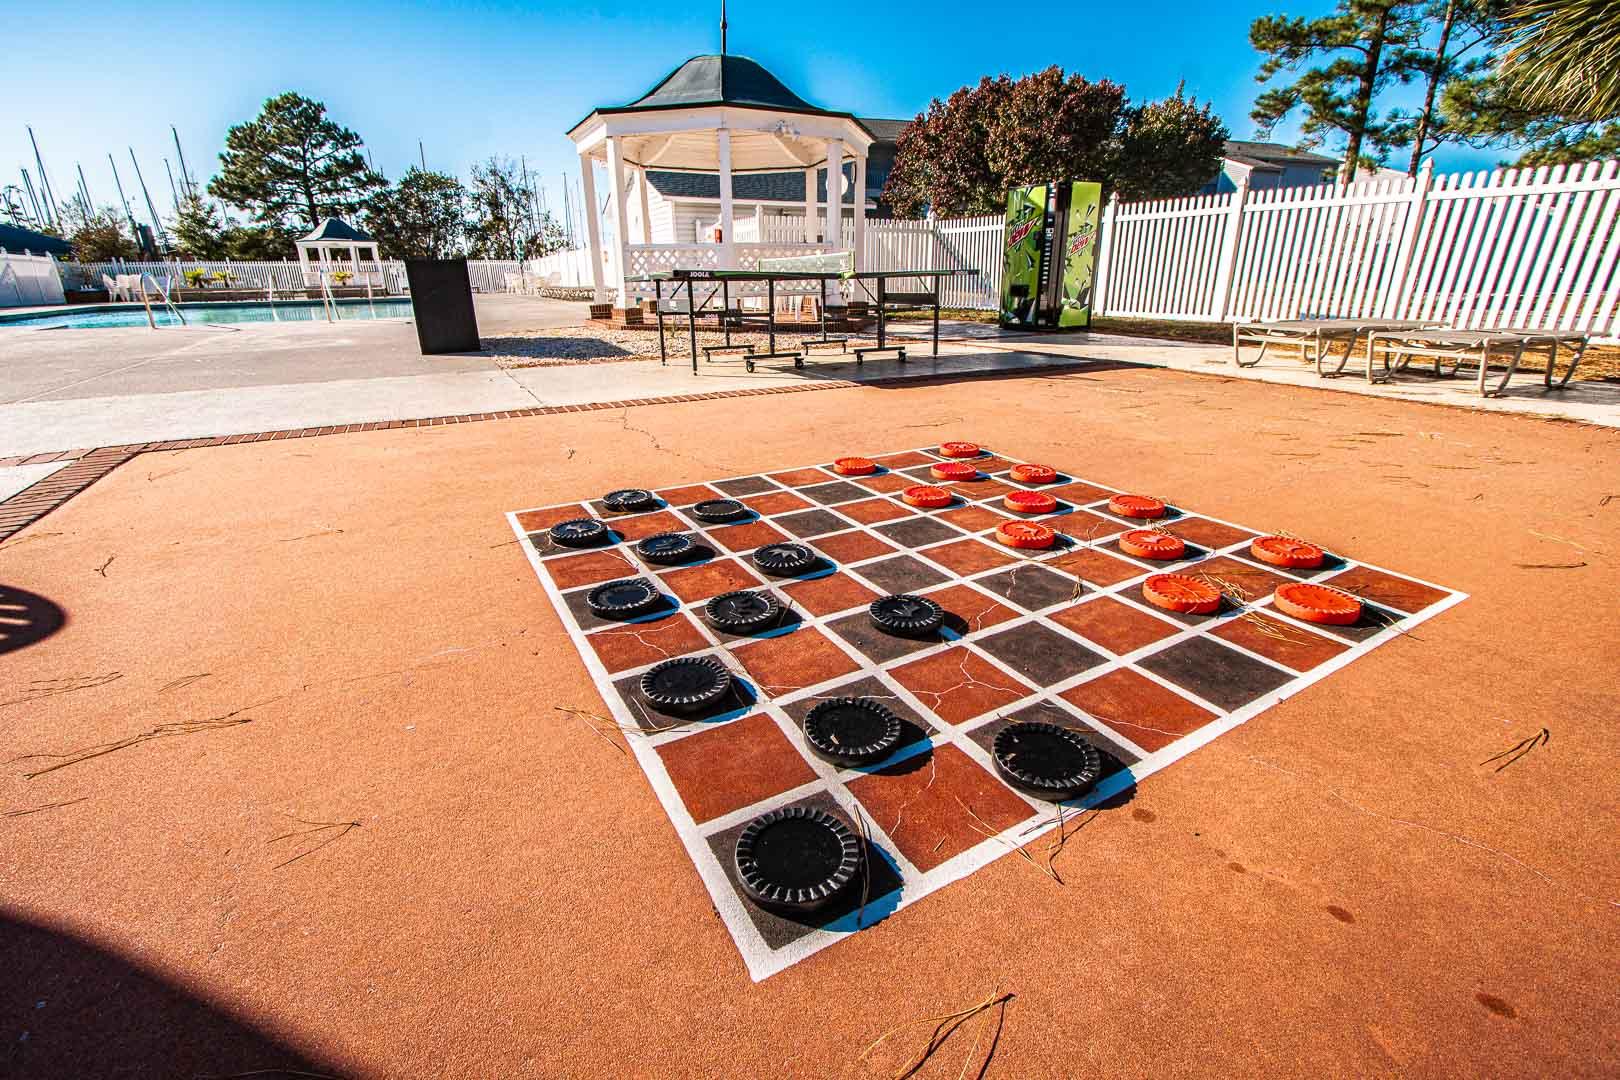 A jumbo outdoor checkers board at VRI's Harbourside II in New Bern, North Carolina.